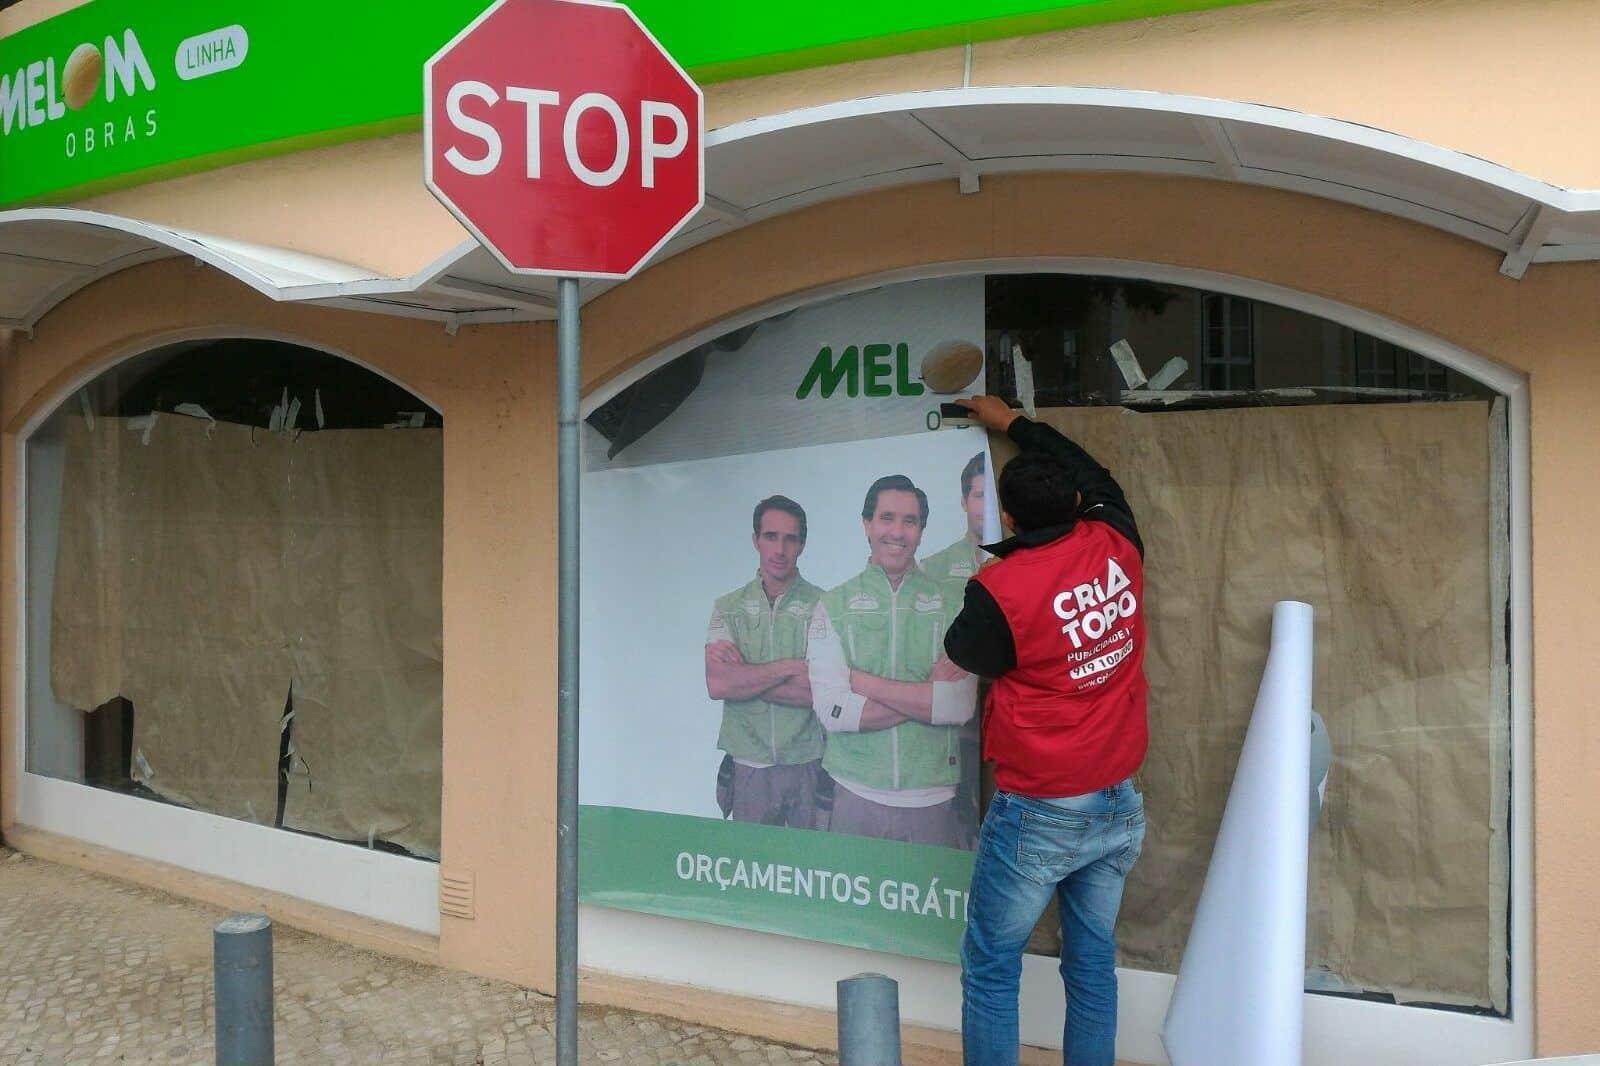 Decoração de Montras – decoração de montras de lojas – vinil -autocolante para montras